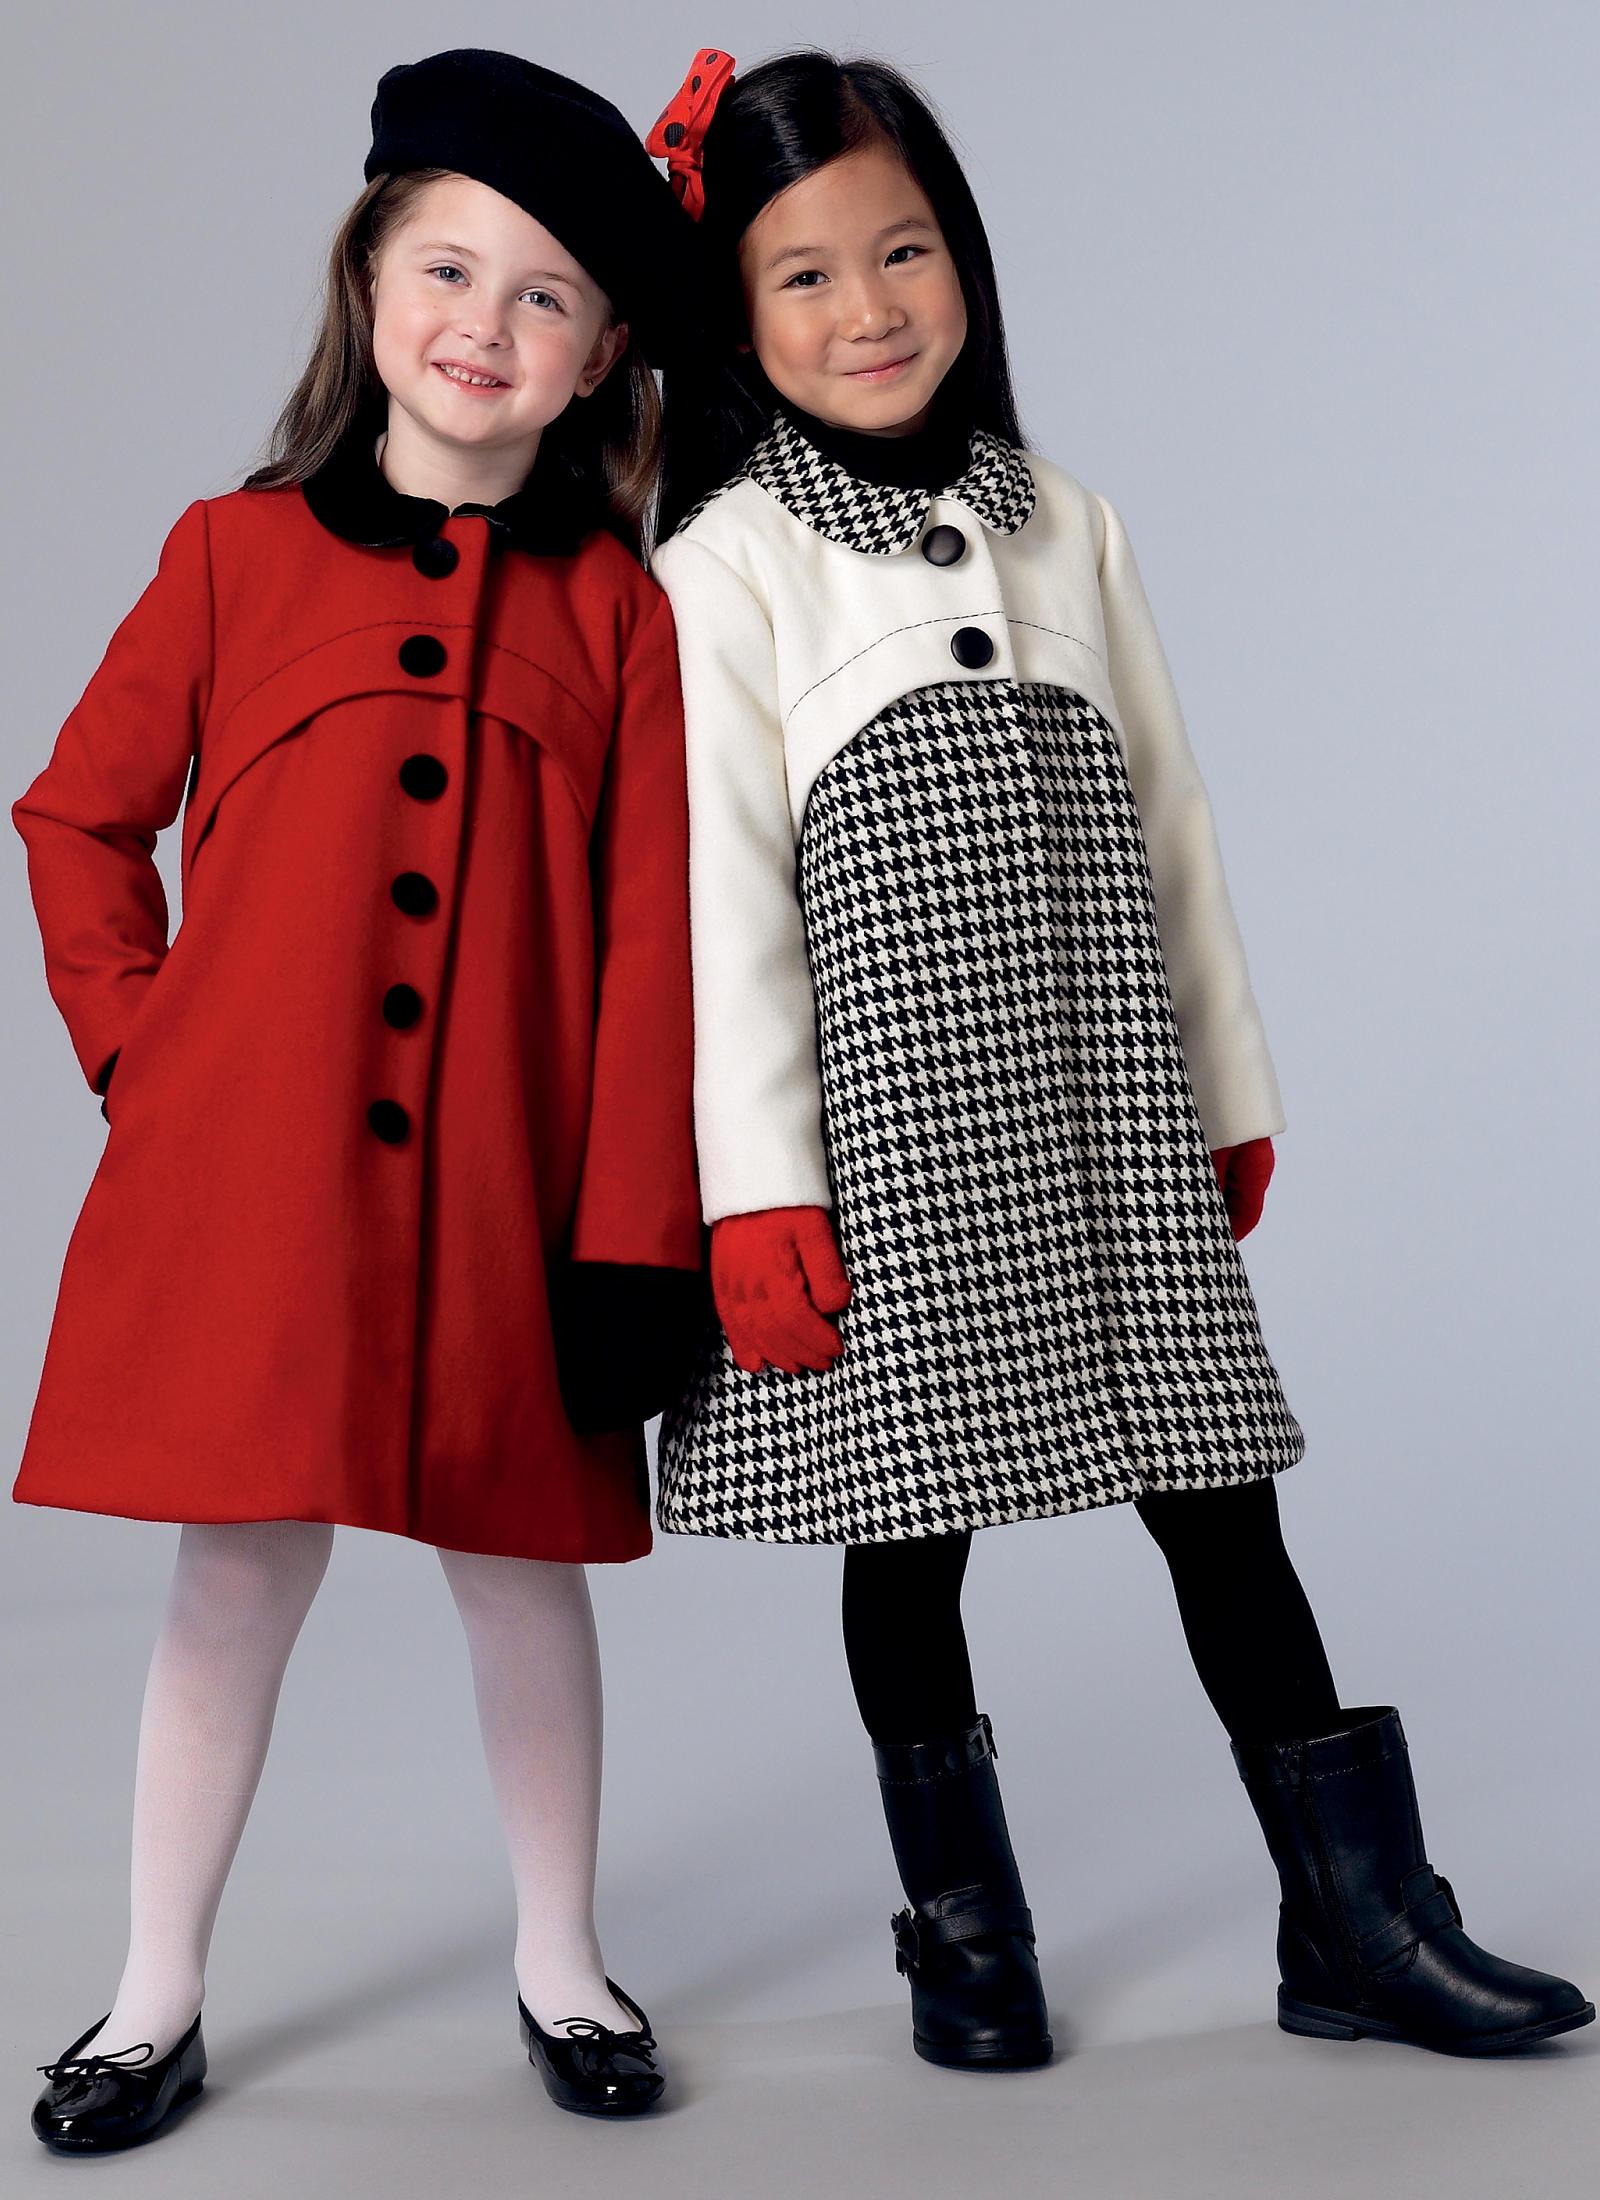 e62598158df Vogue Patterns 9219 CHILDREN S GIRLS  SNAP-CLOSURE COATS ...